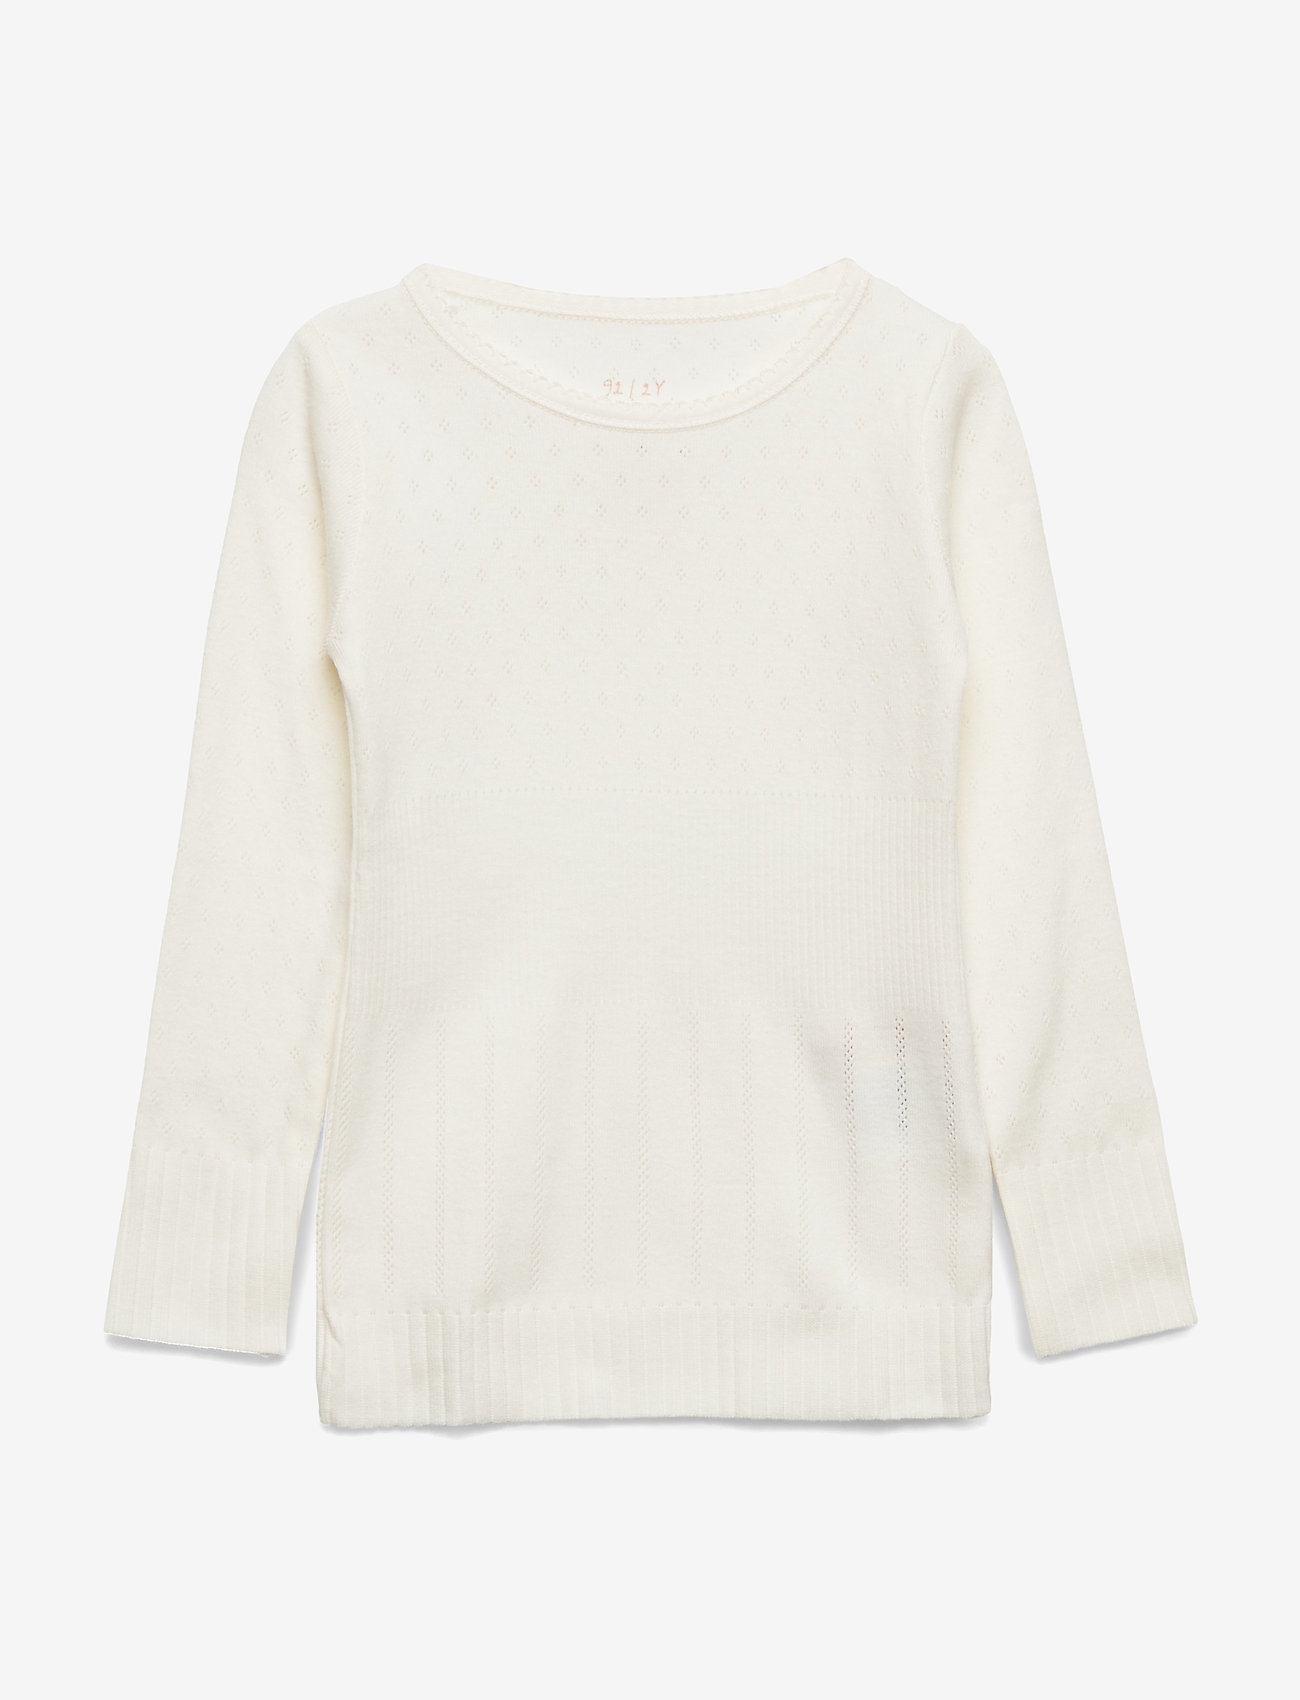 Noa Noa Miniature - T-shirt - long-sleeved t-shirts - chalk - 0